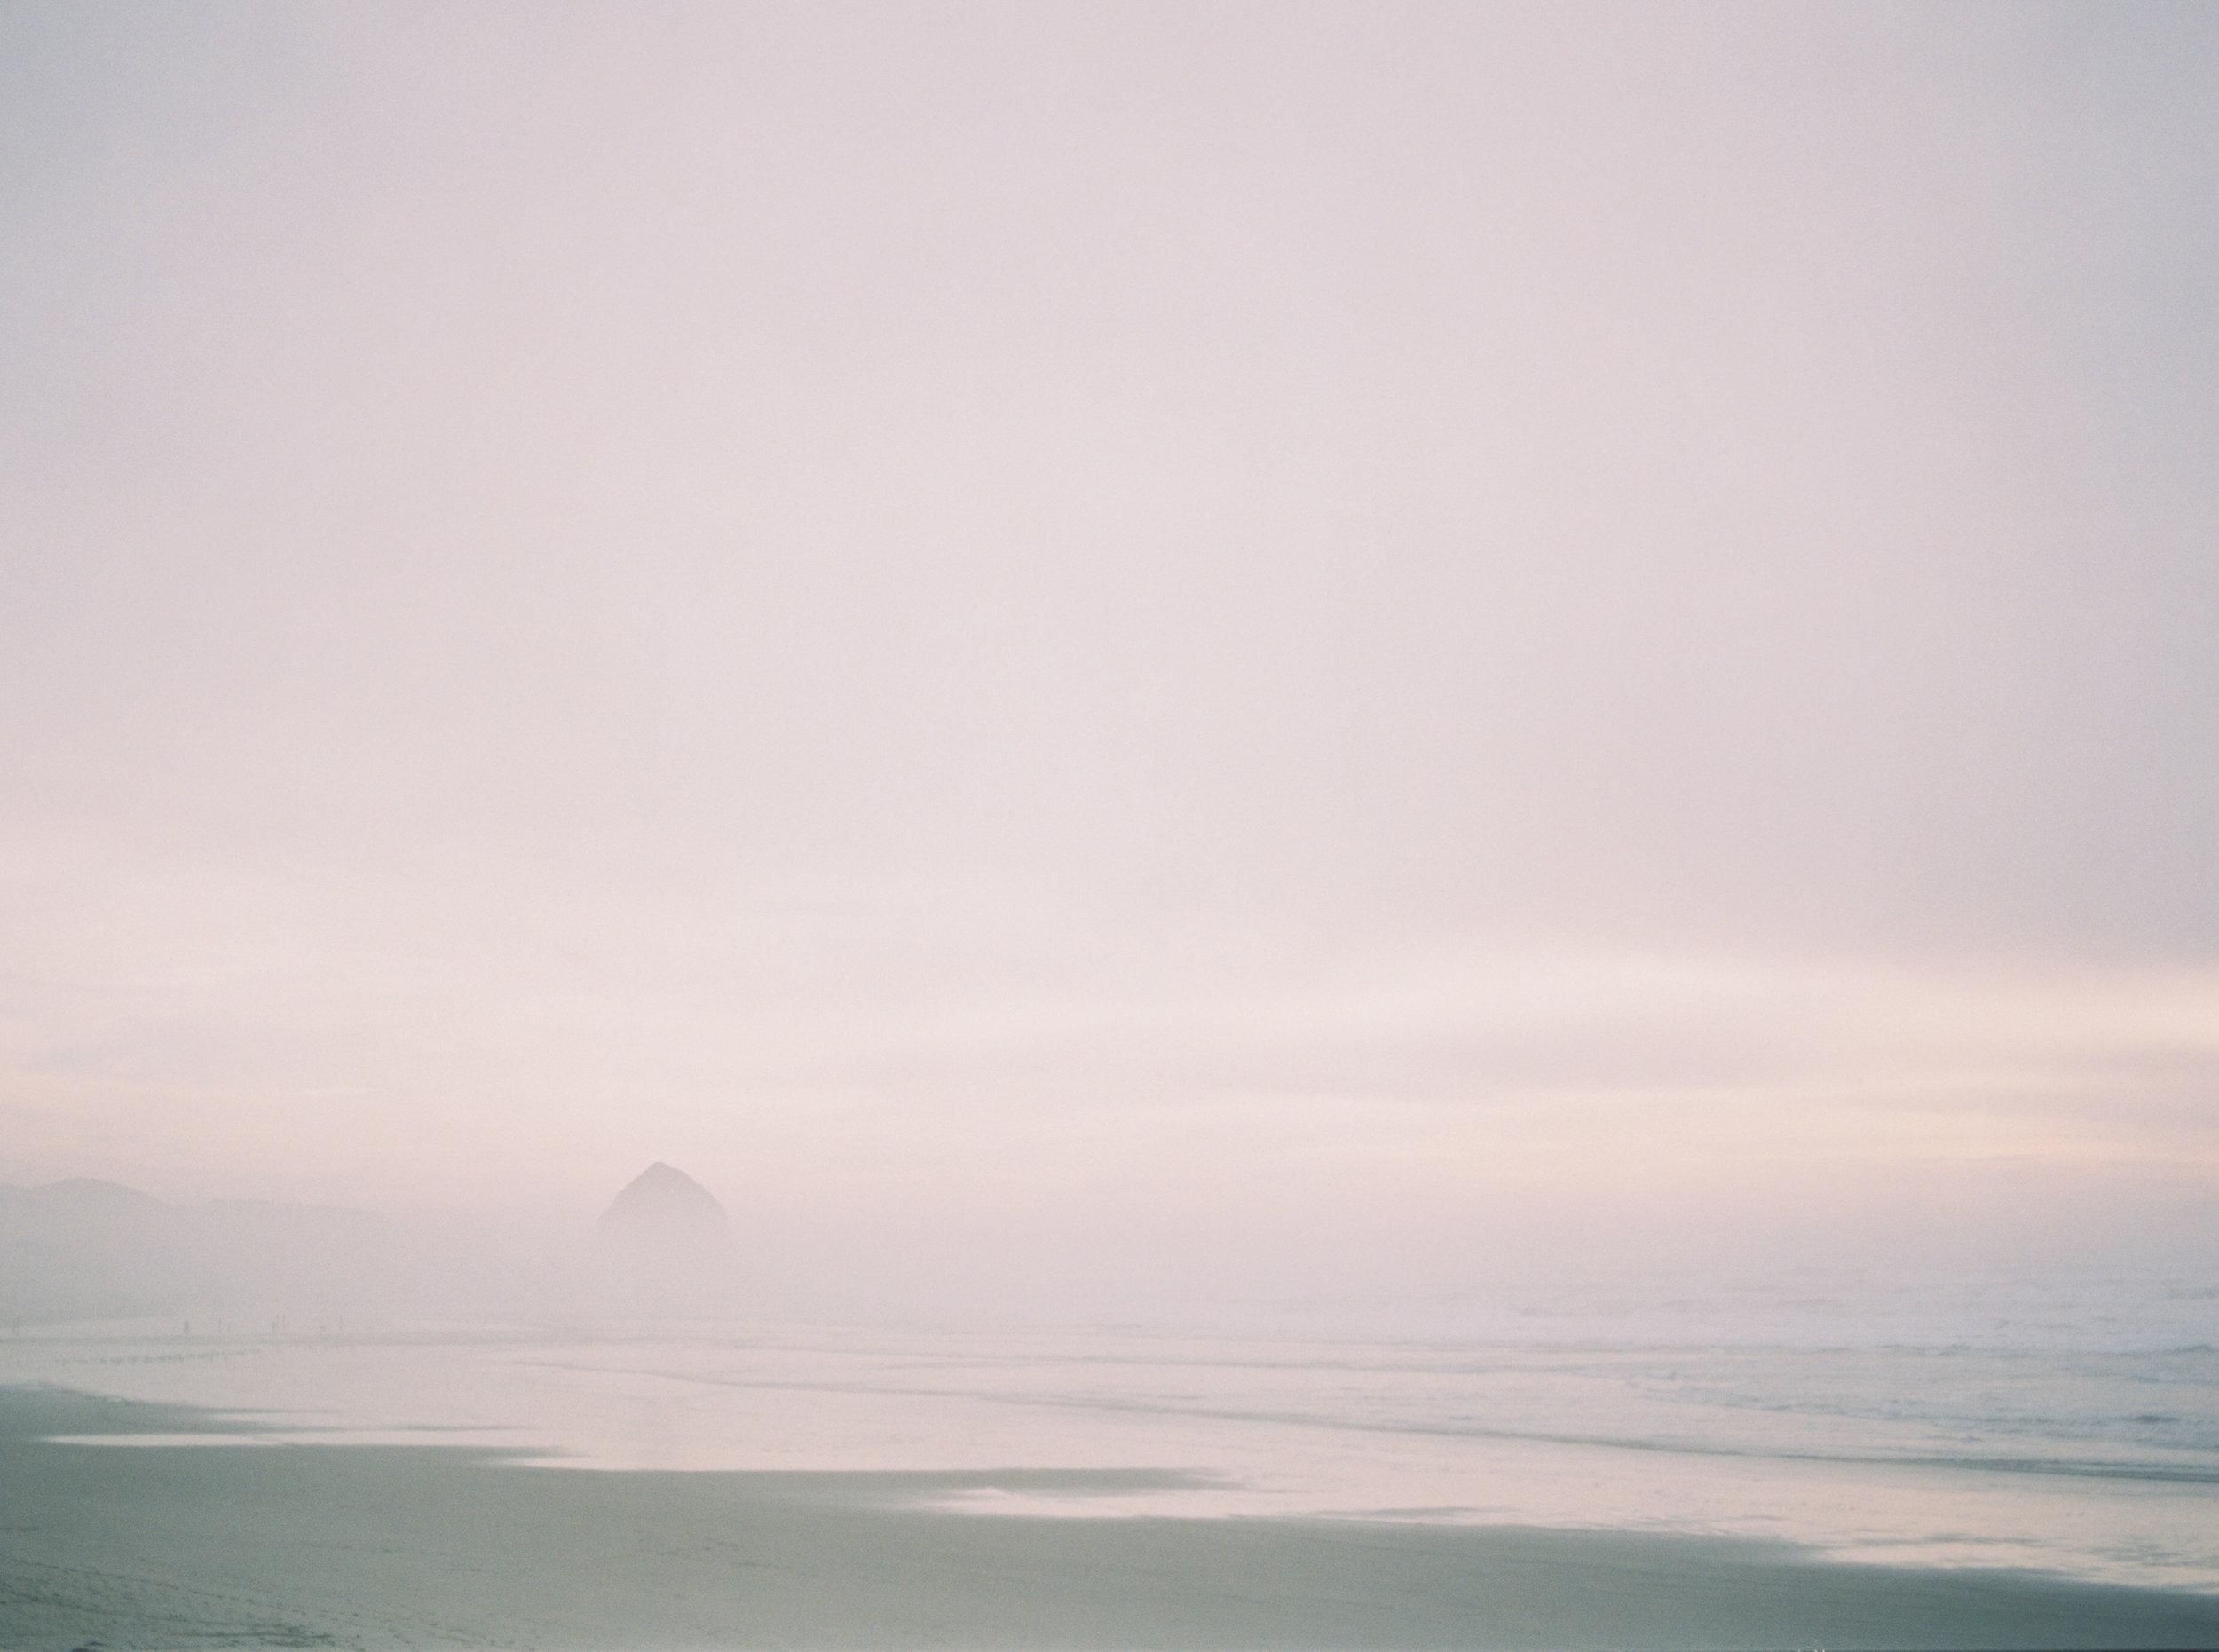 jakeanderson-filmphotographer-destinatinophotographer-travel-unearthingtc-27.jpg